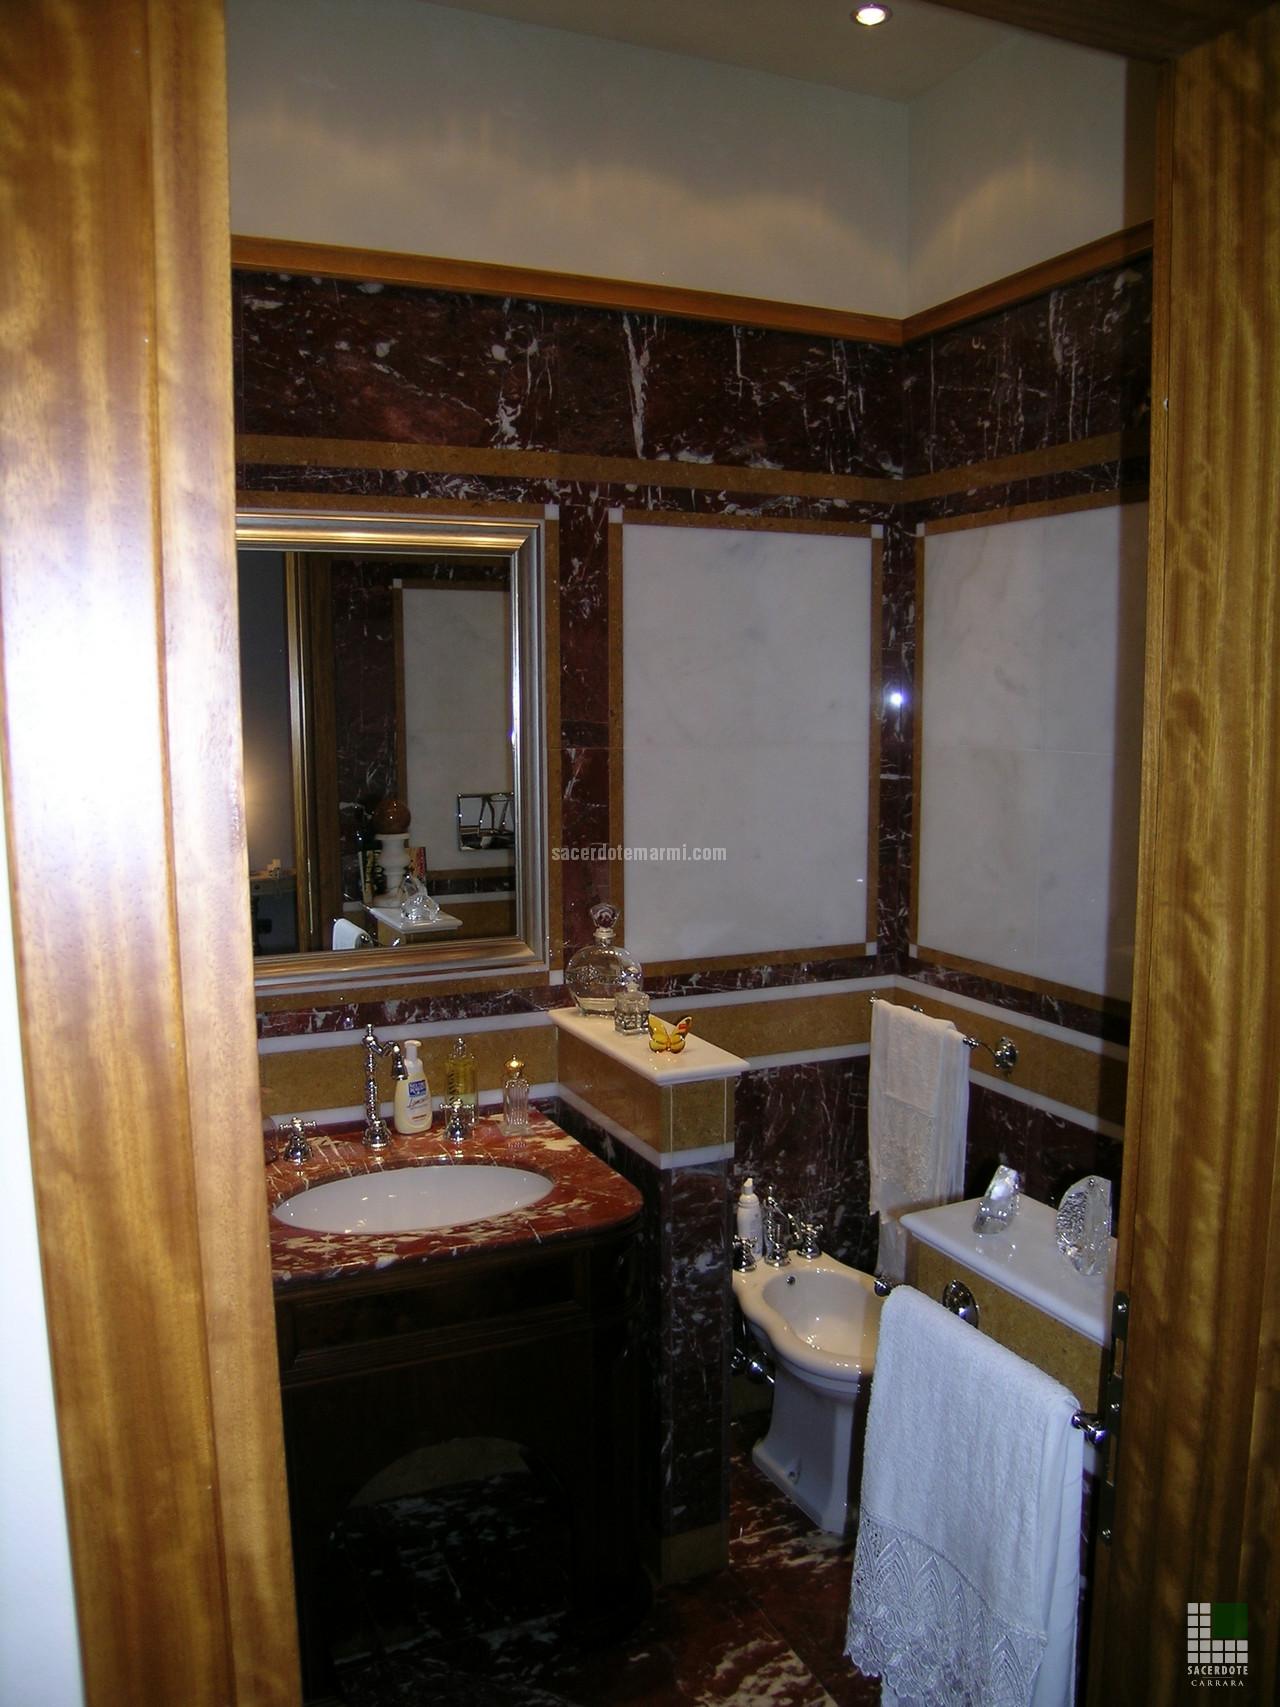 Bagni residenza roma sacerdote marmi carrara - Bagno marmo bianco ...